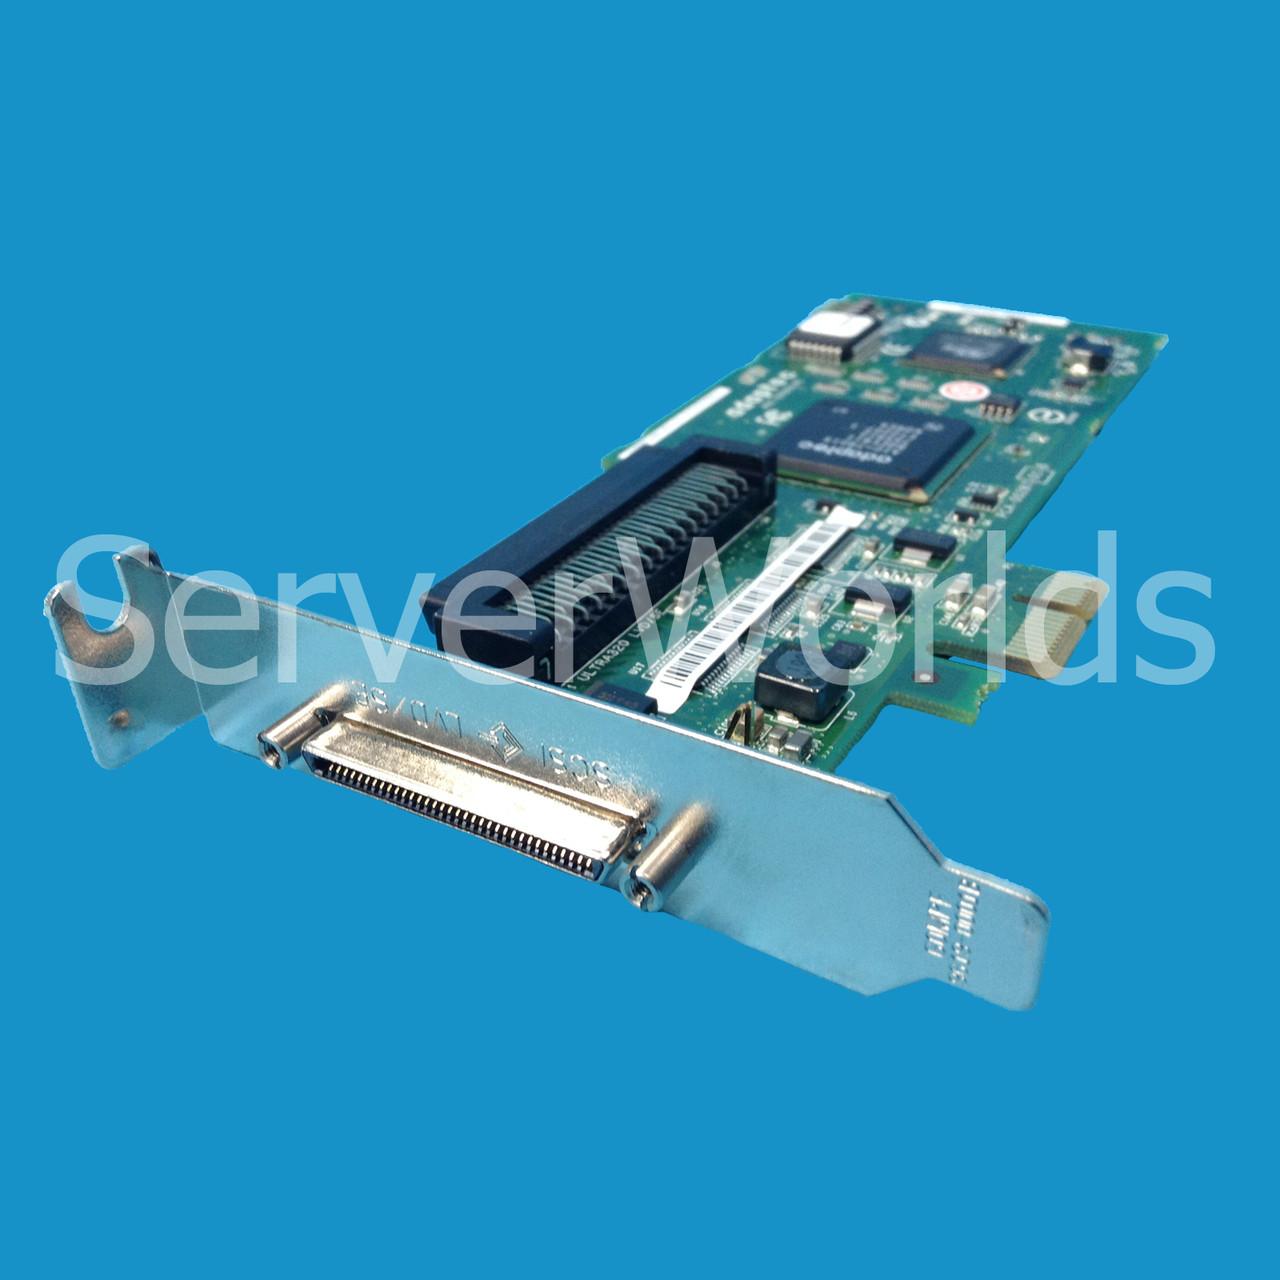 ADAPTEC SCSI CARD 29320LPE PCIE WINDOWS 7 DRIVERS DOWNLOAD (2019)